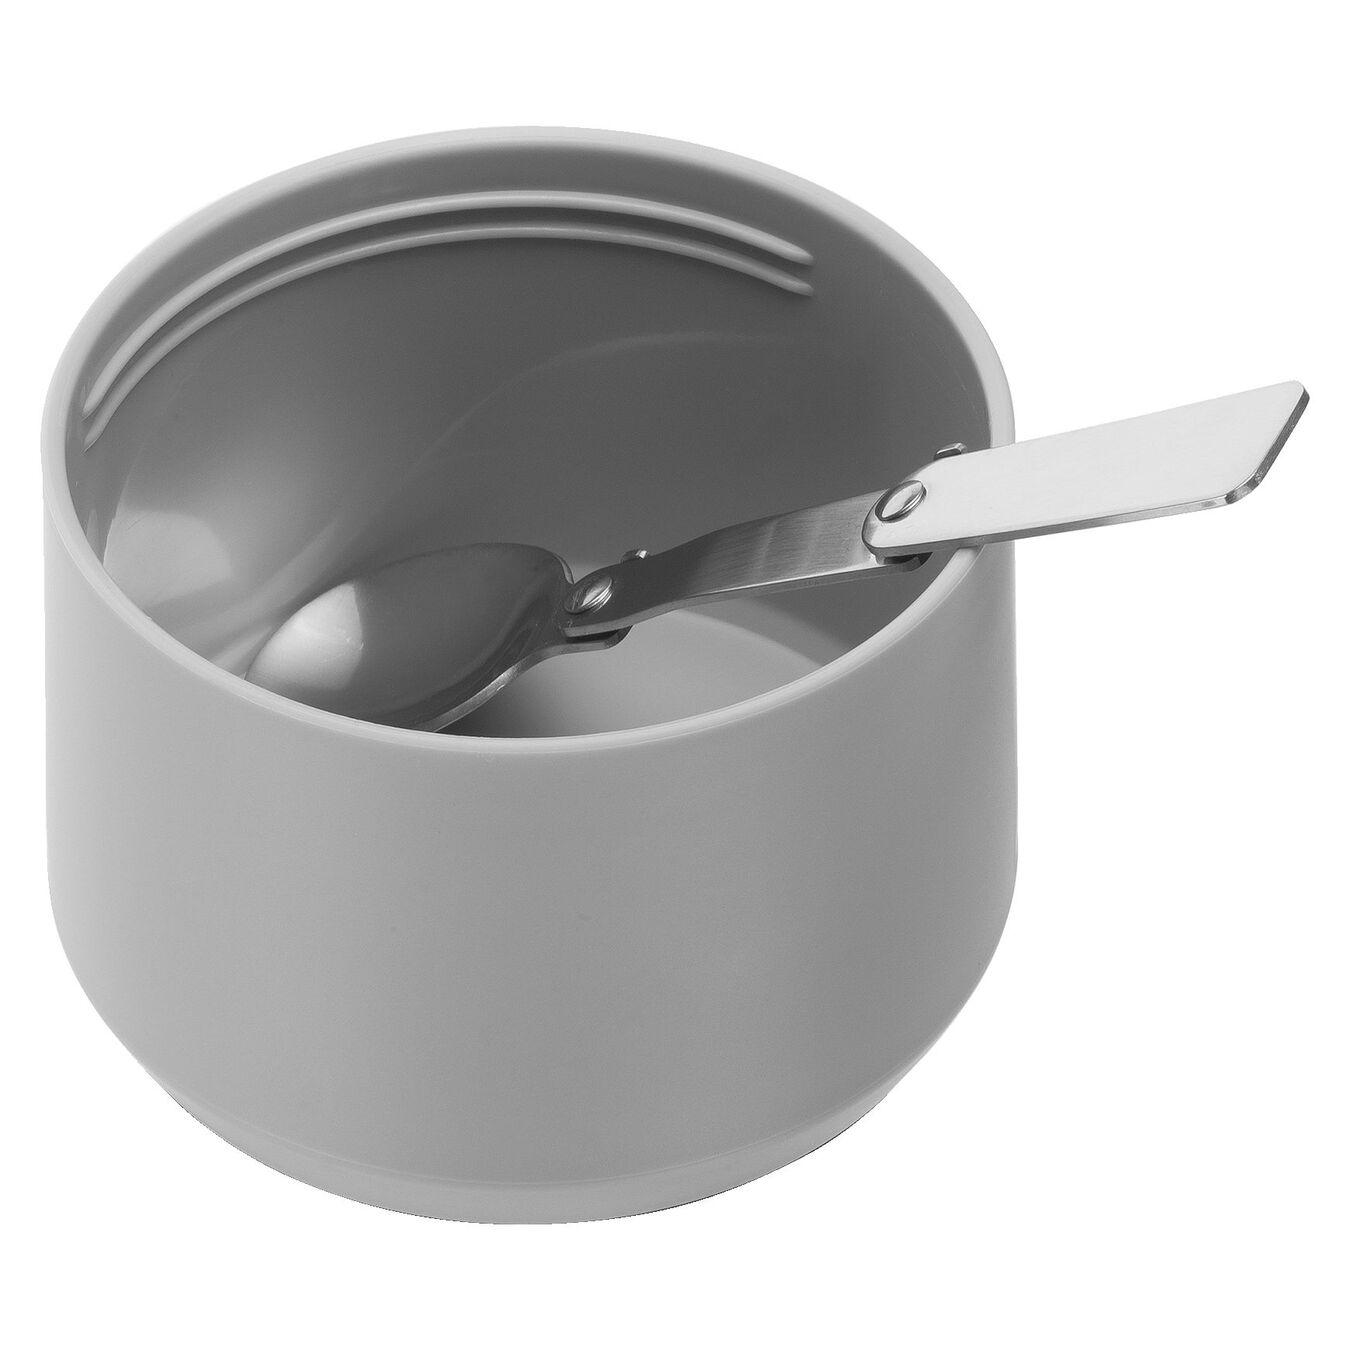 Recipiente alimentare - 700 ml, acciaio inox, bianco,,large 4